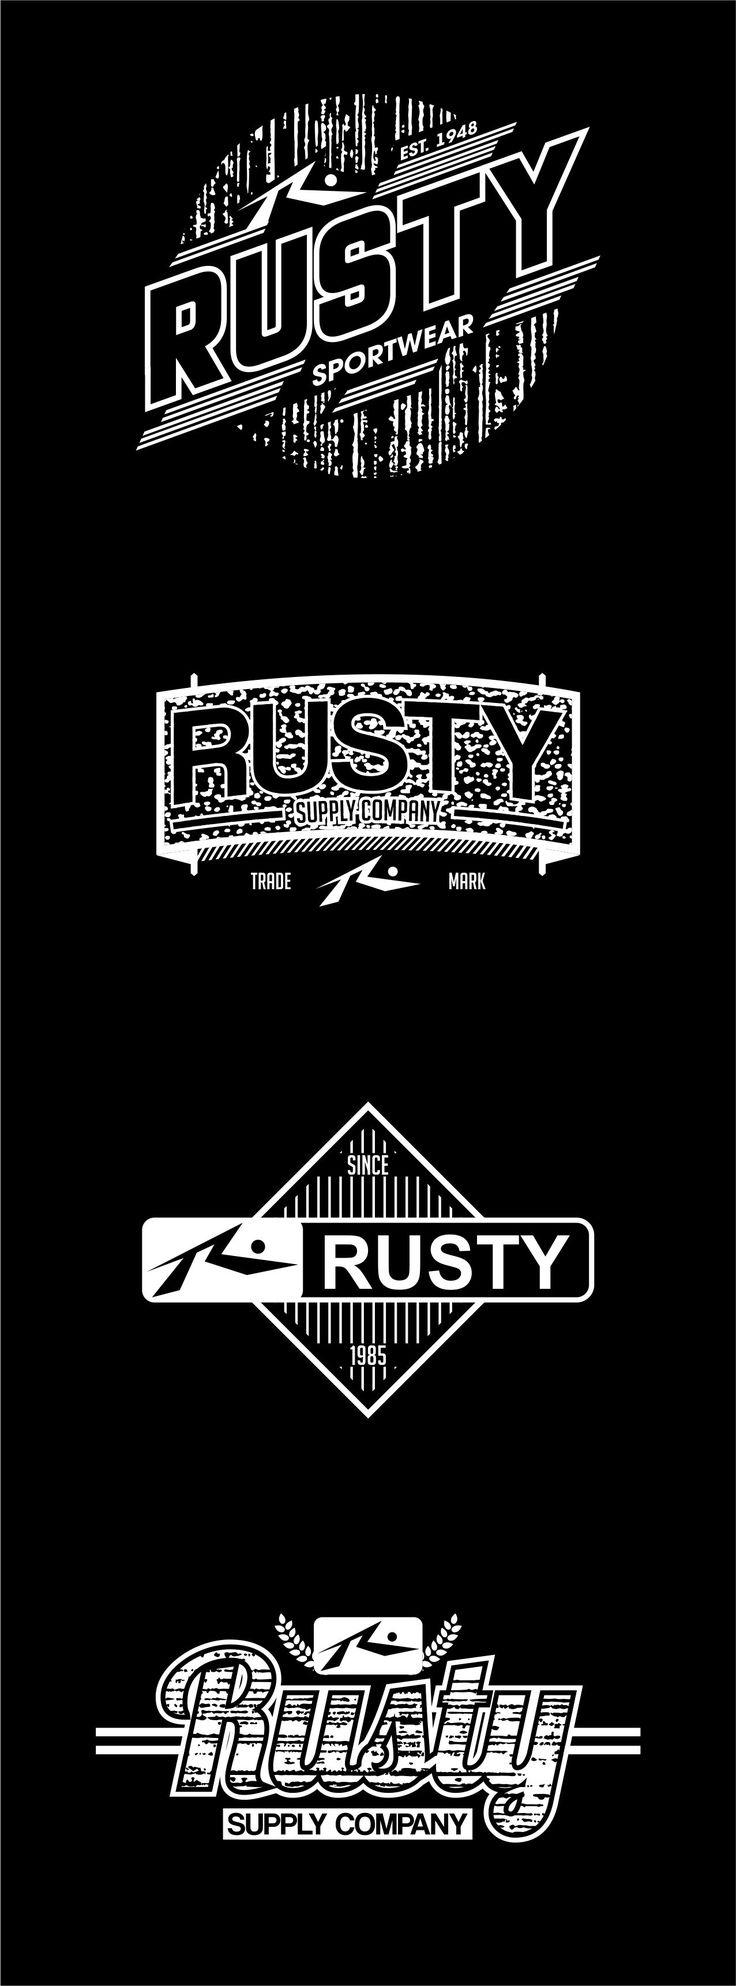 Vintage Rusty #vintage #vector #vintagevector #volcom #adidas #billabong #rusty #nike #puma #levis #quiksilver #ripcurl #dc #vans #spyderbilt #reebok